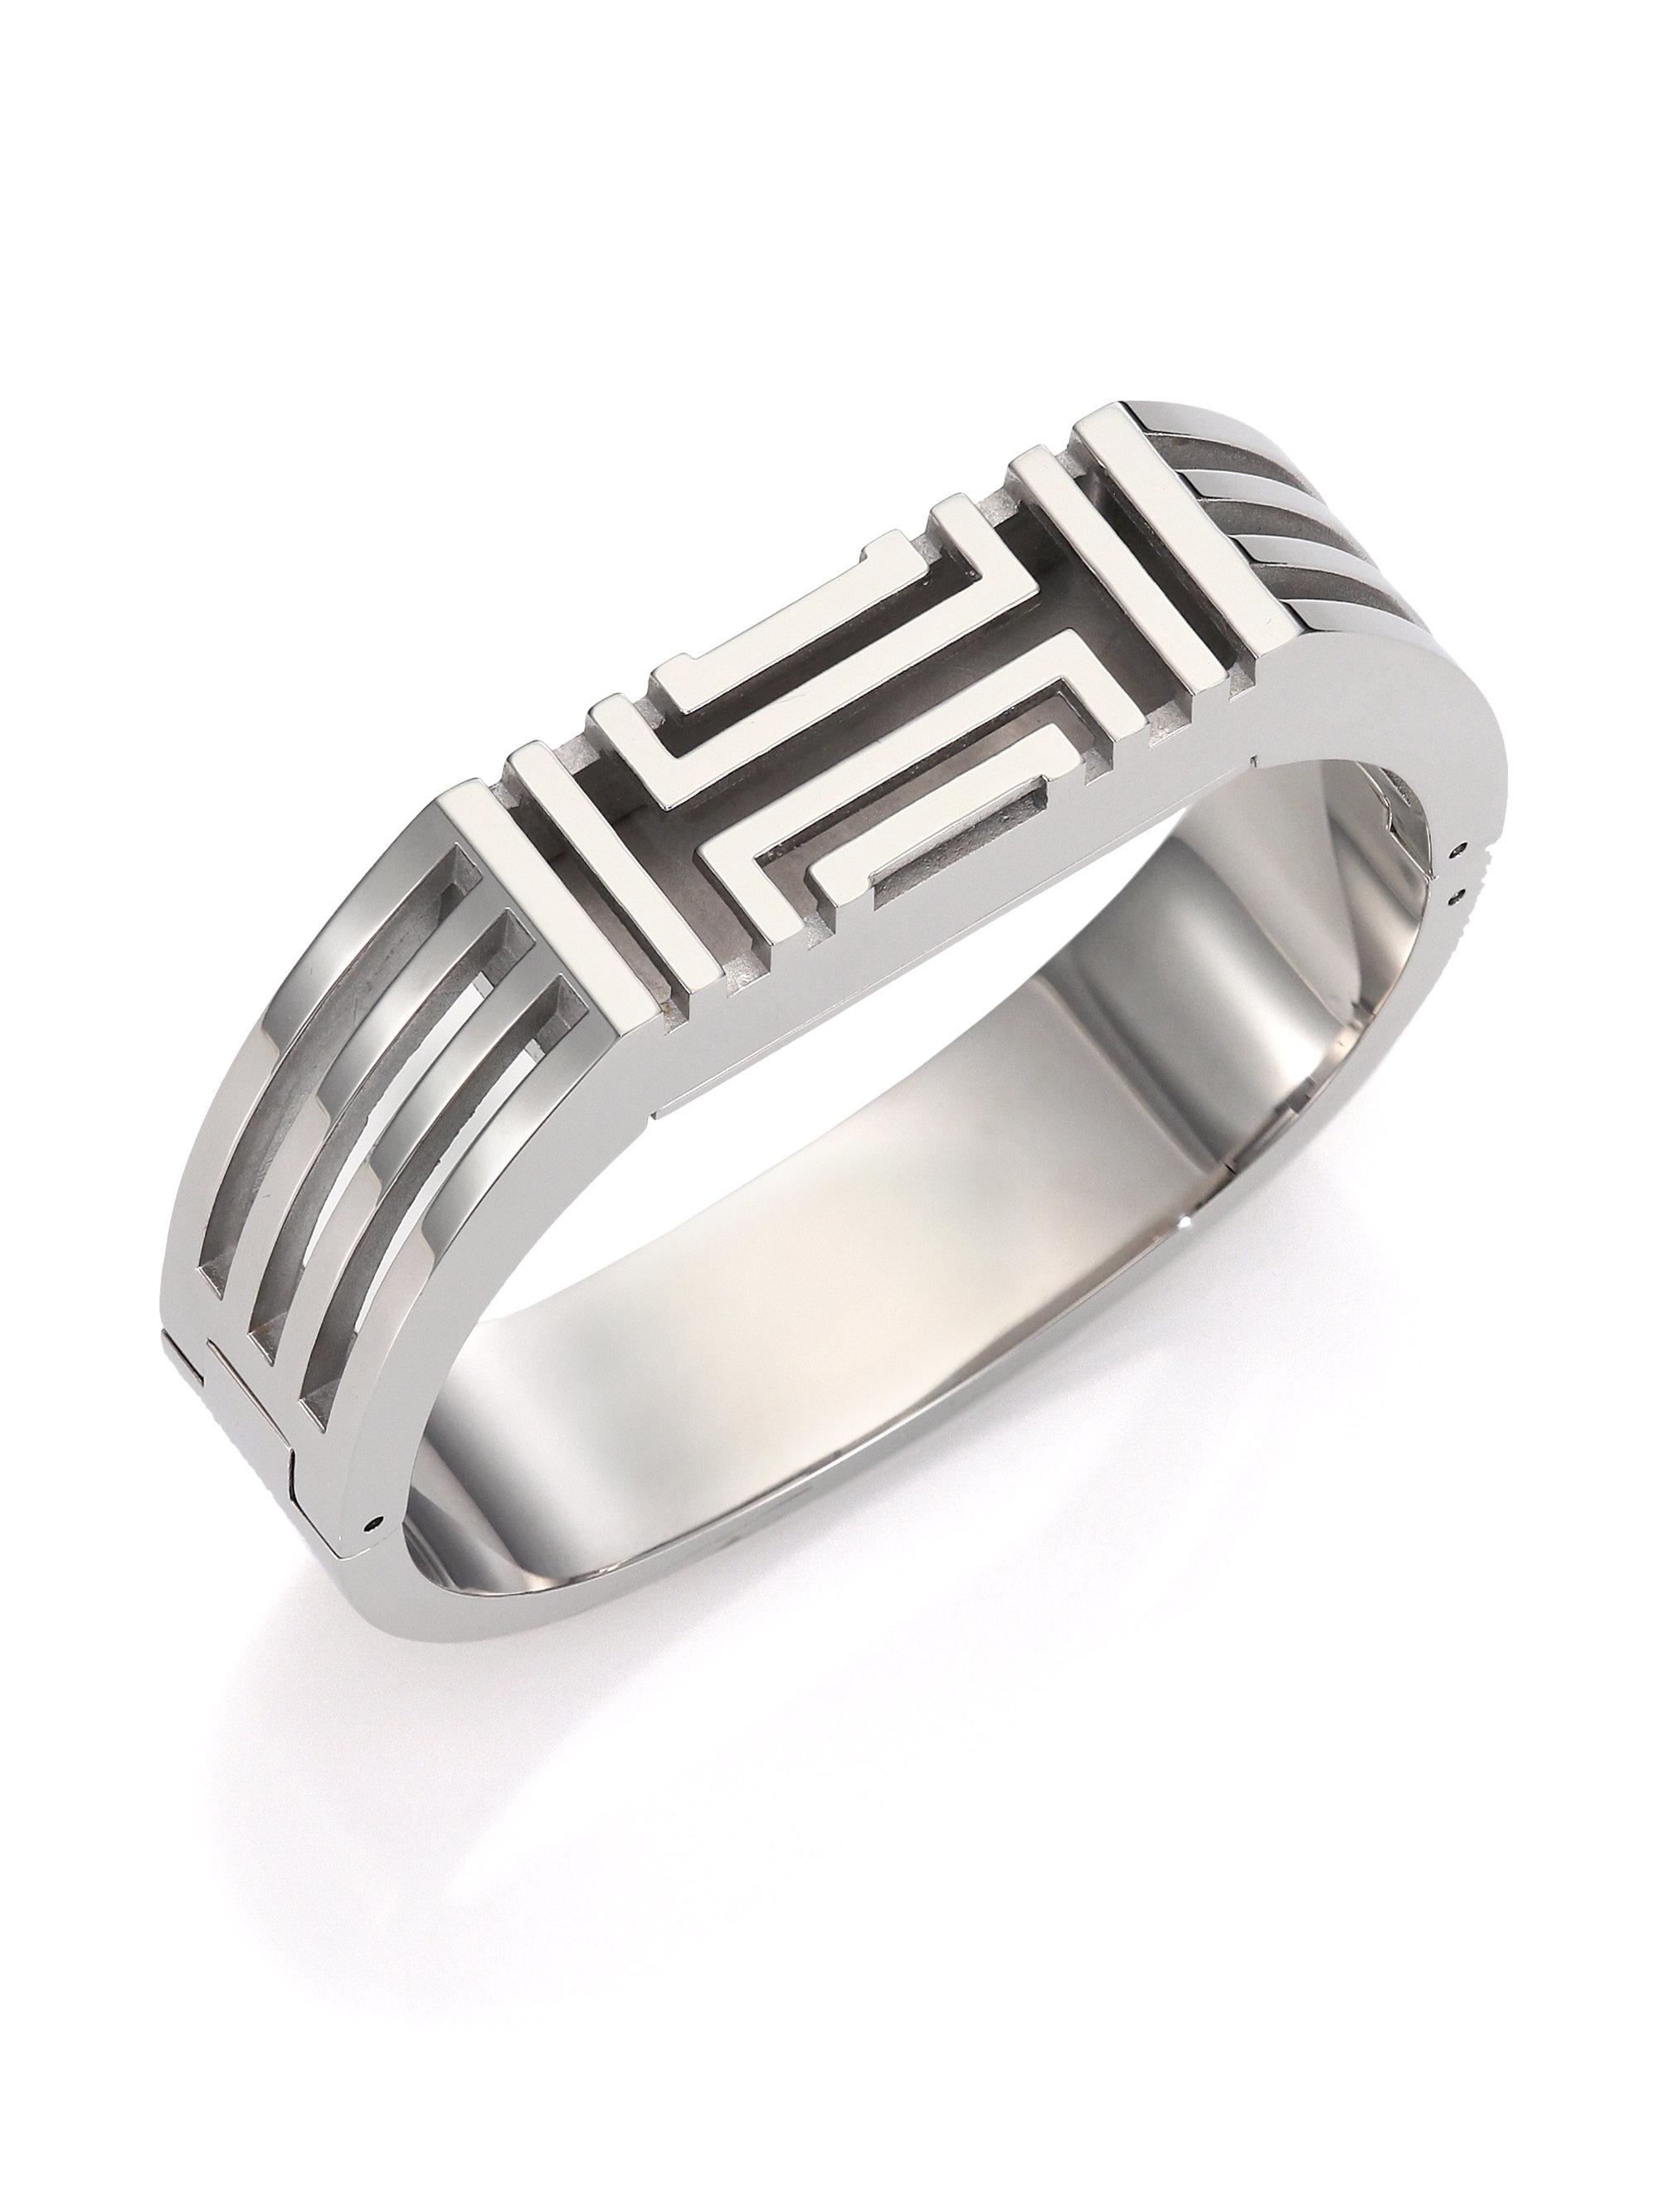 Tory Burch For Fitbit Bangle Bracelet Silvertone In